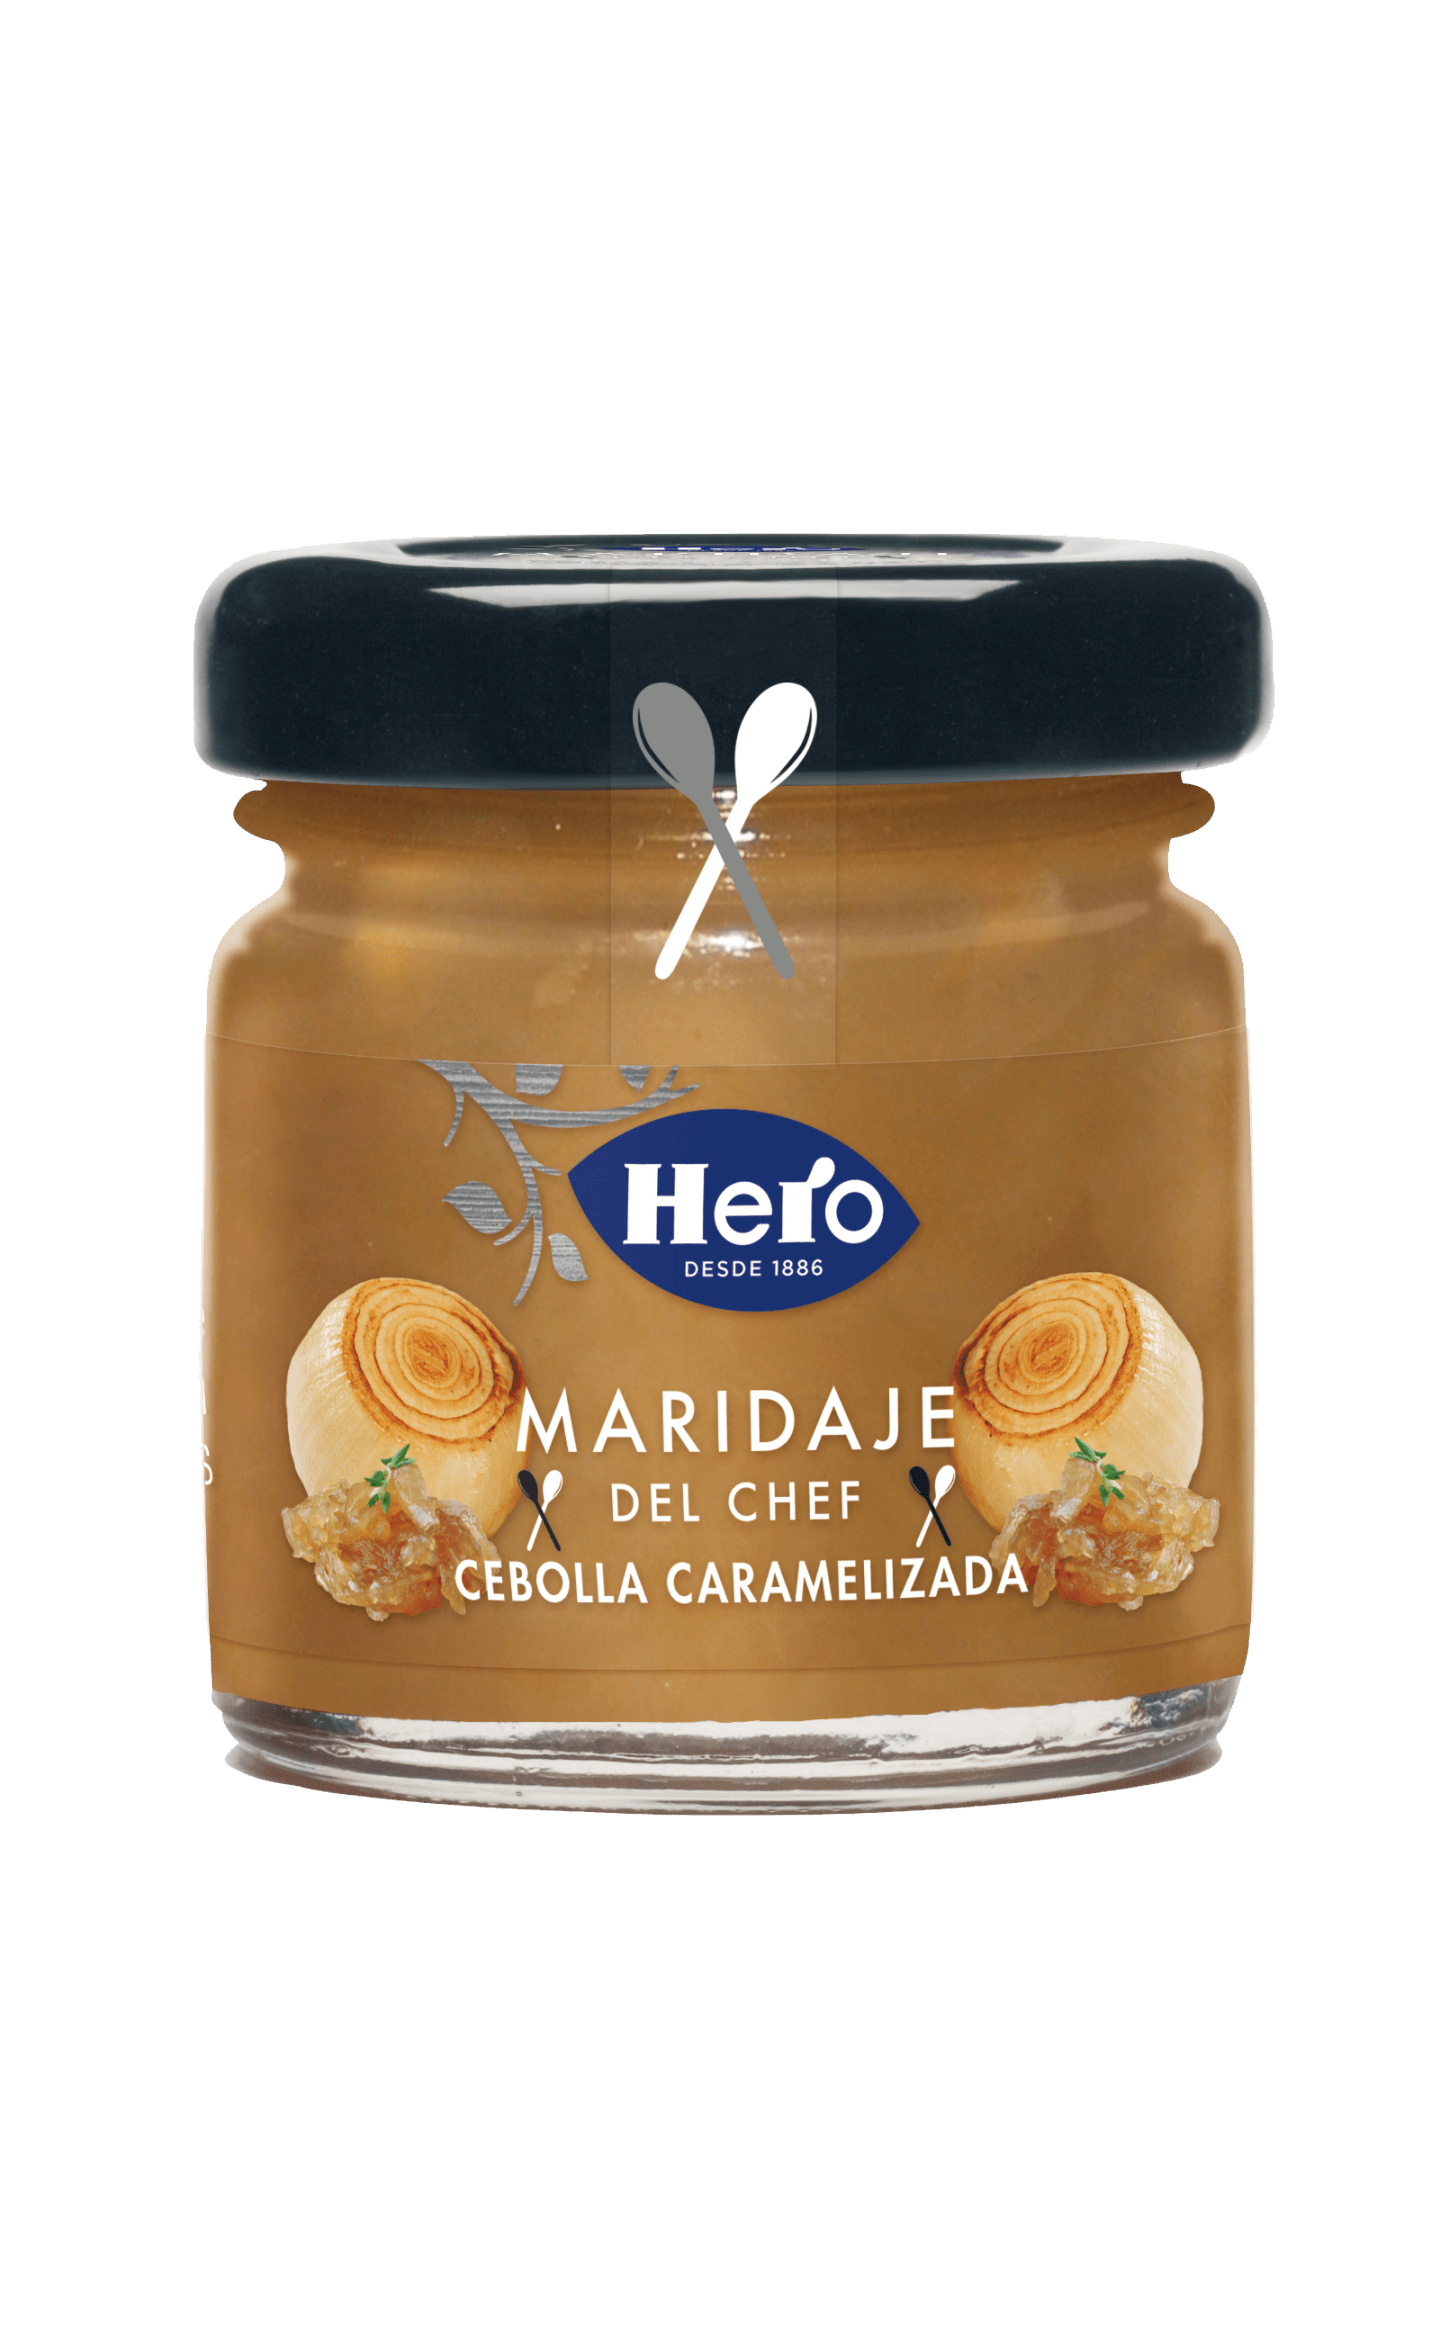 Maridaje de Cebolla Caramelizada